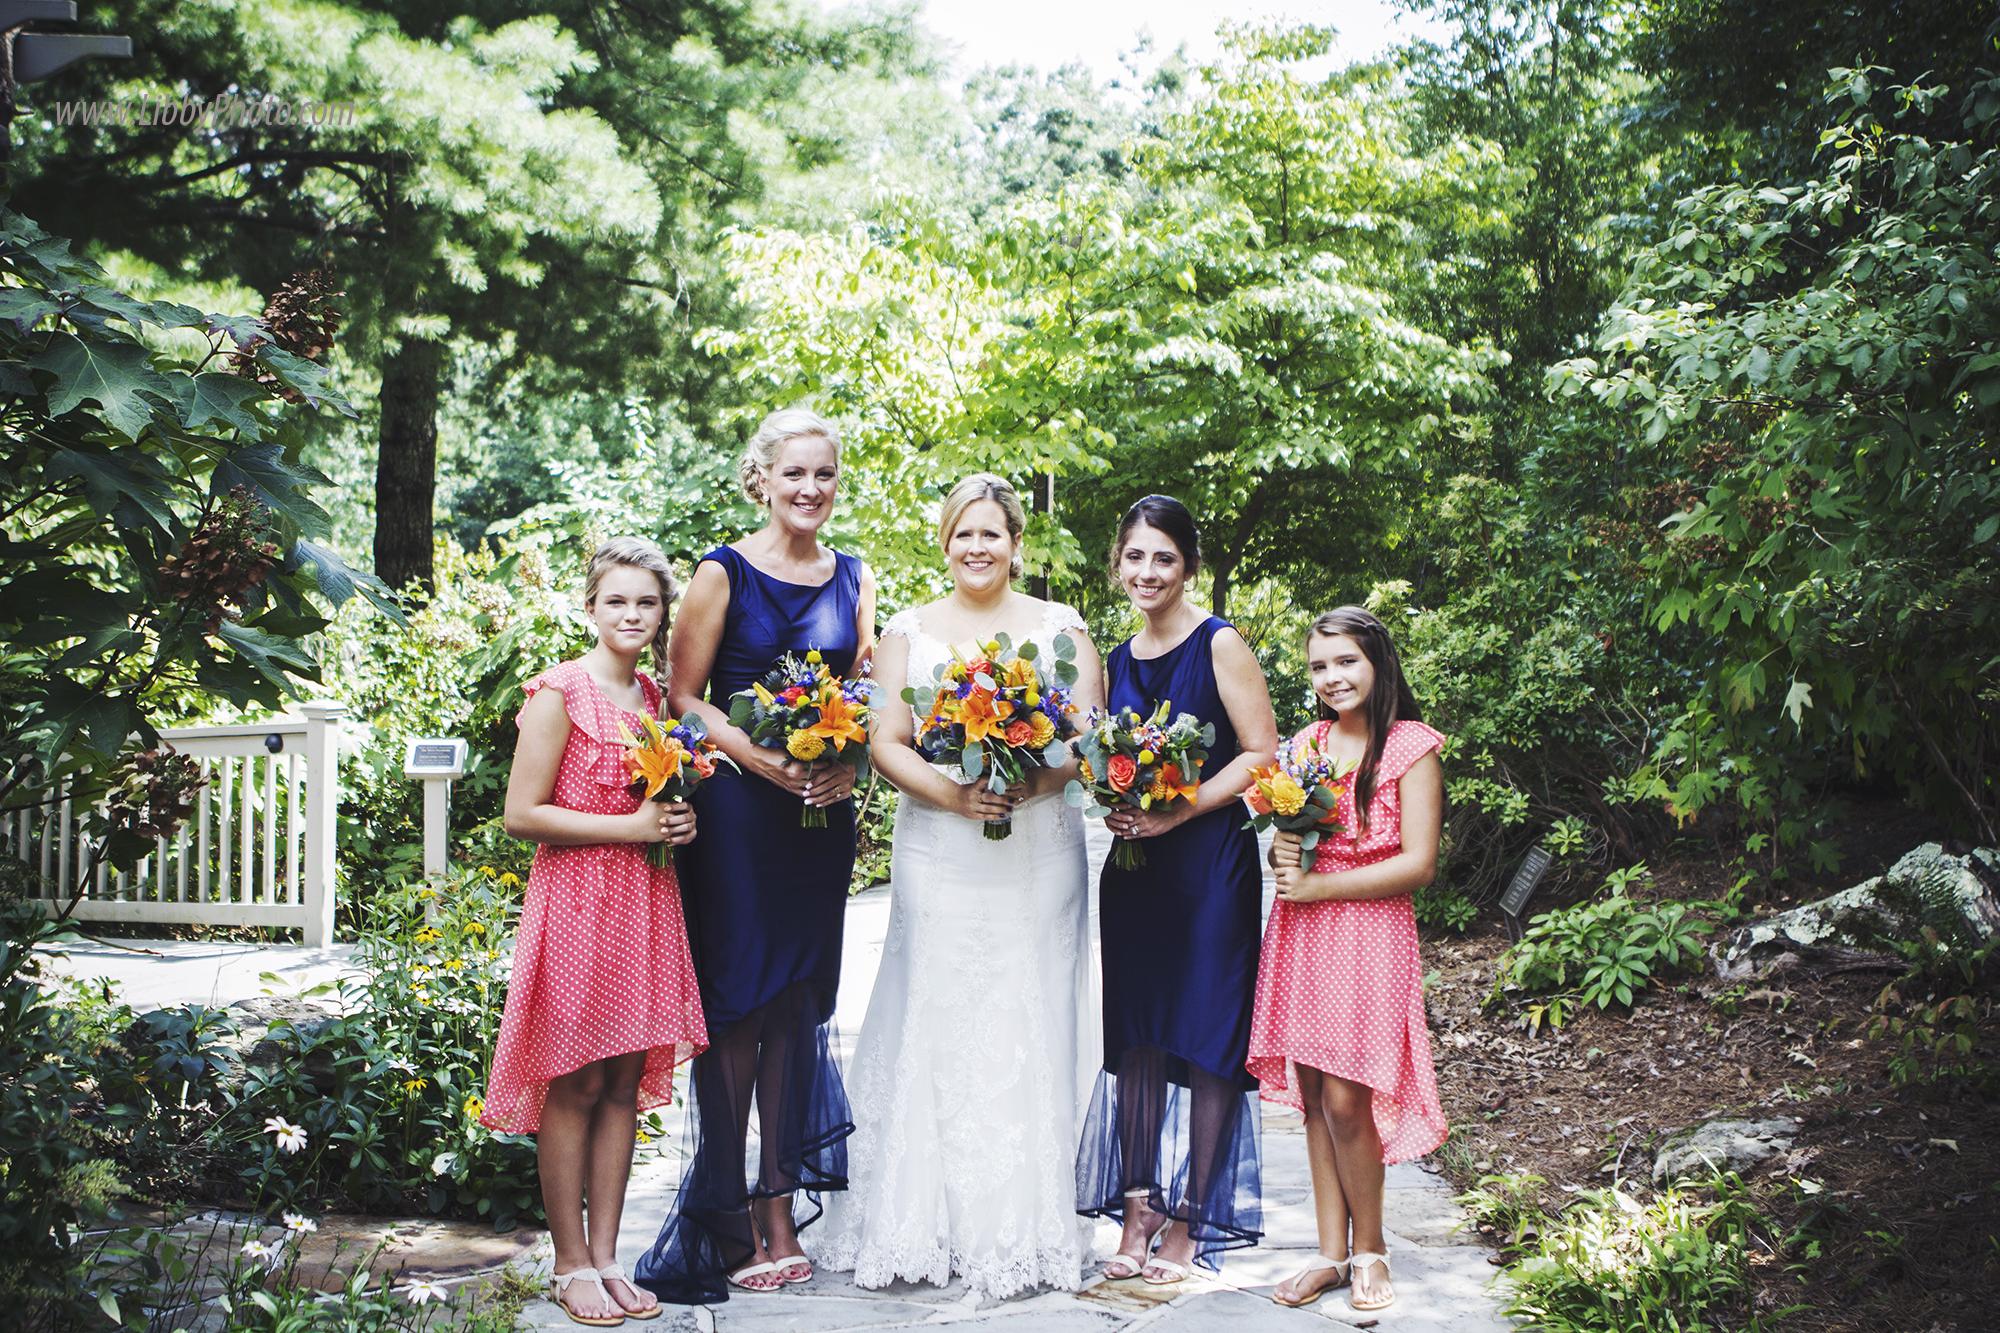 Atlanta wedding photography, Libbyphoto11 (1).jpg